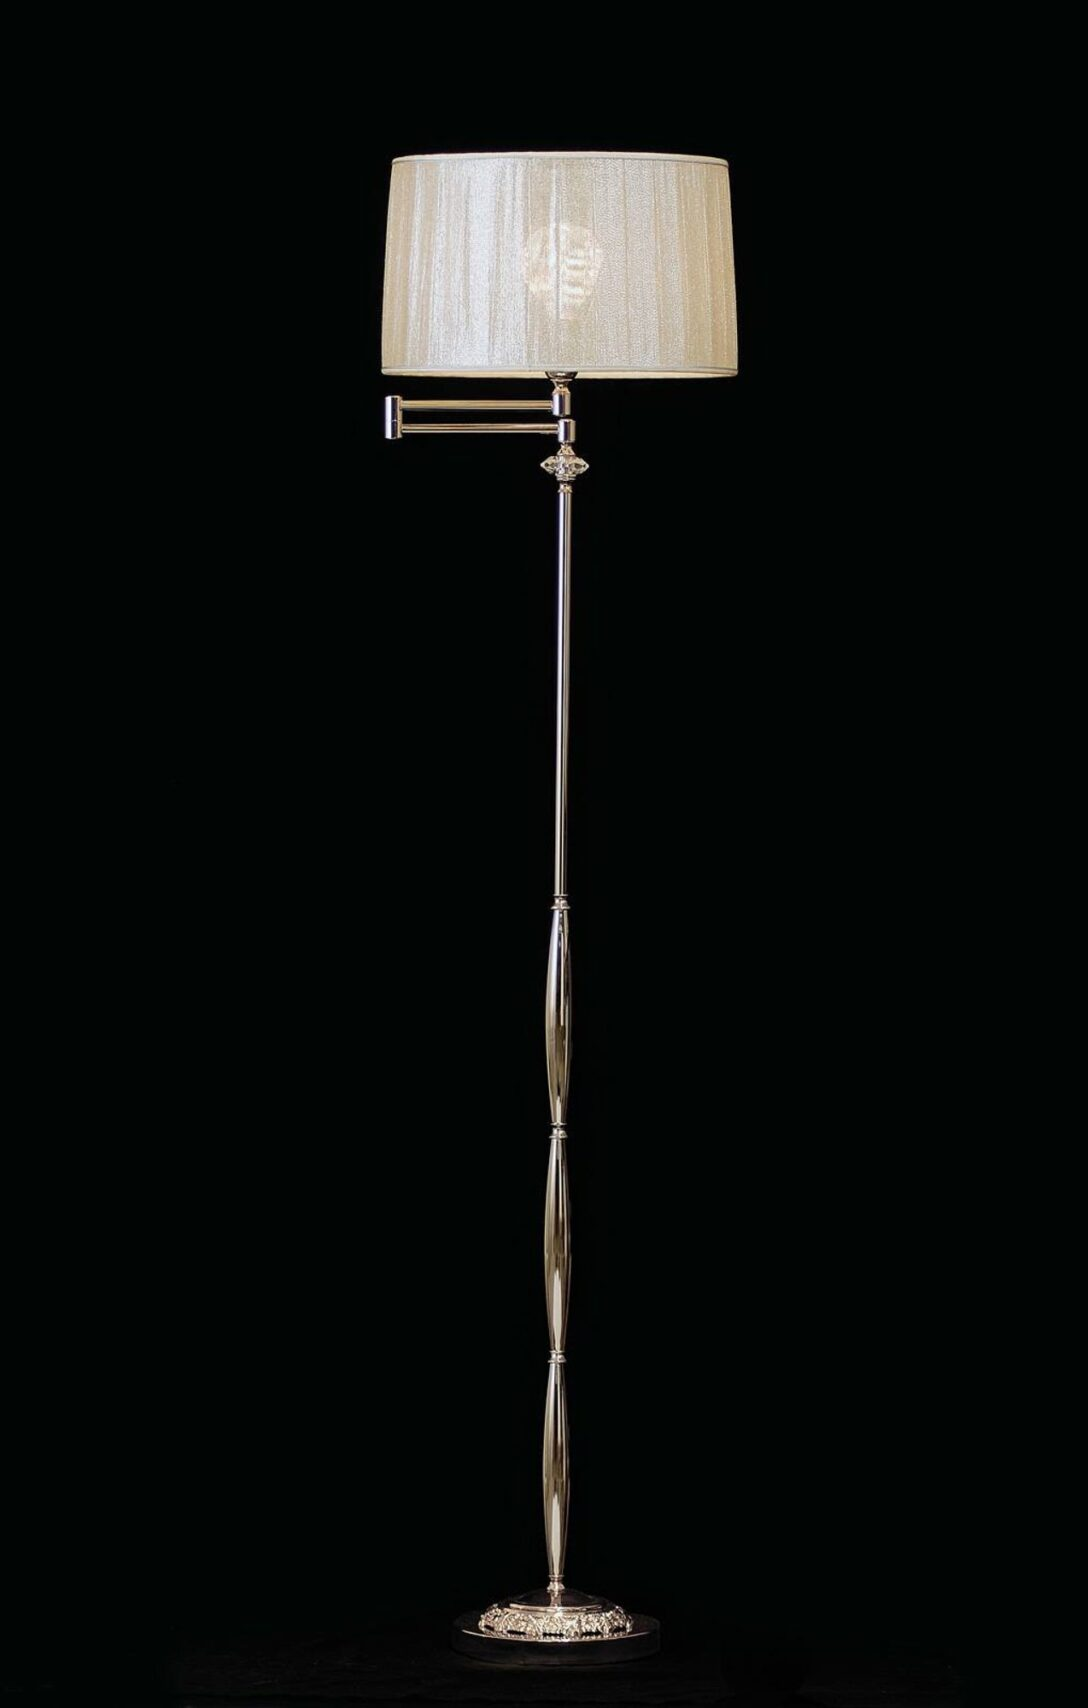 Large Size of Kristall Stehlampe Il Paralume Marina Mira Stehleuchte Pinlight Wohnzimmer Stehlampen Schlafzimmer Wohnzimmer Kristall Stehlampe